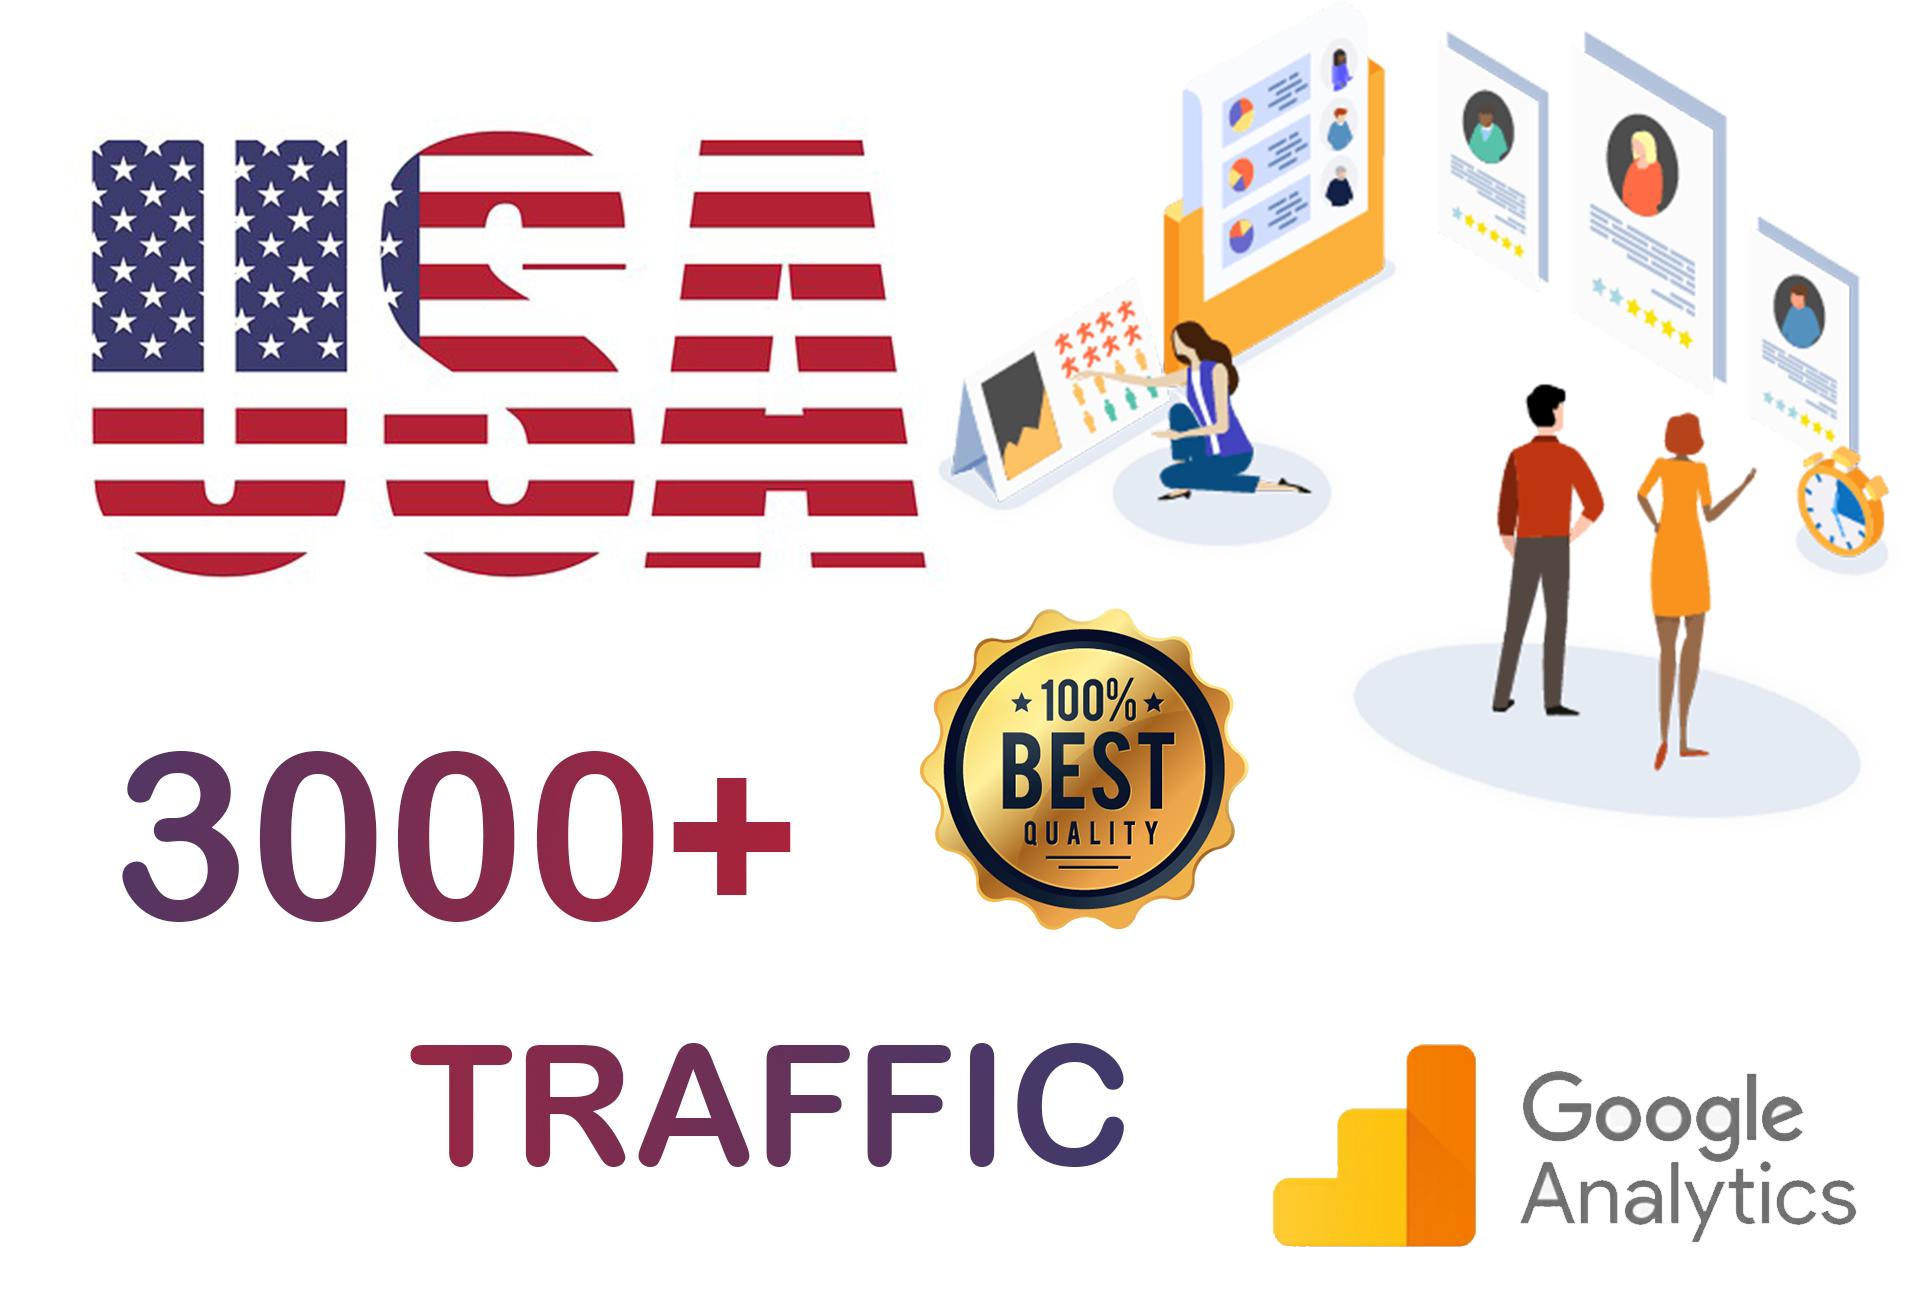 3000 USA Targeted Human Traffic to Your Website Adsense Safe Good Alexa Rank